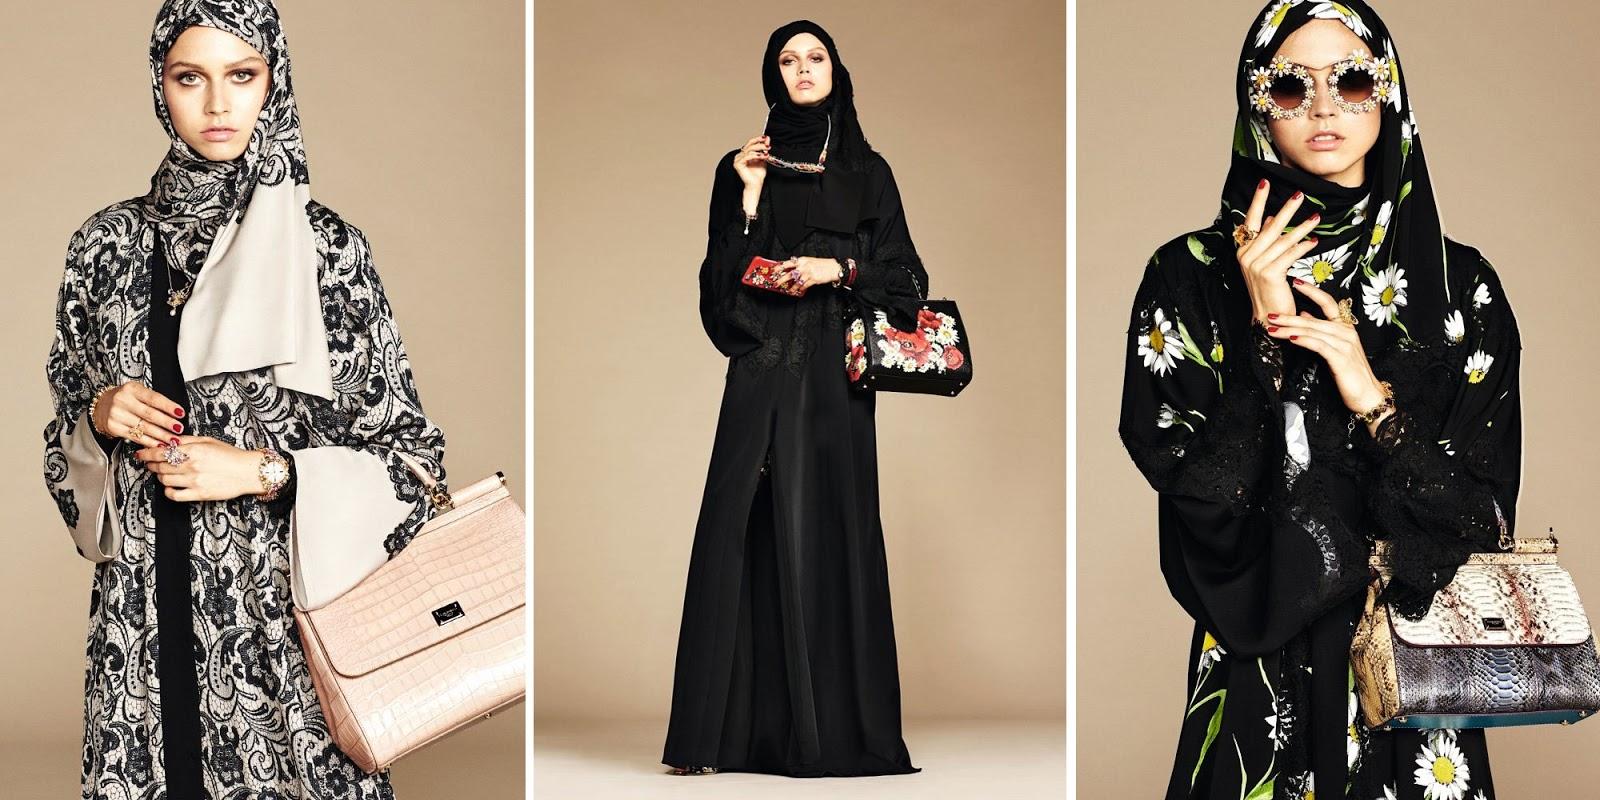 Vogue Arabia Arabian Fashion, Arabian Beauty Trends 24